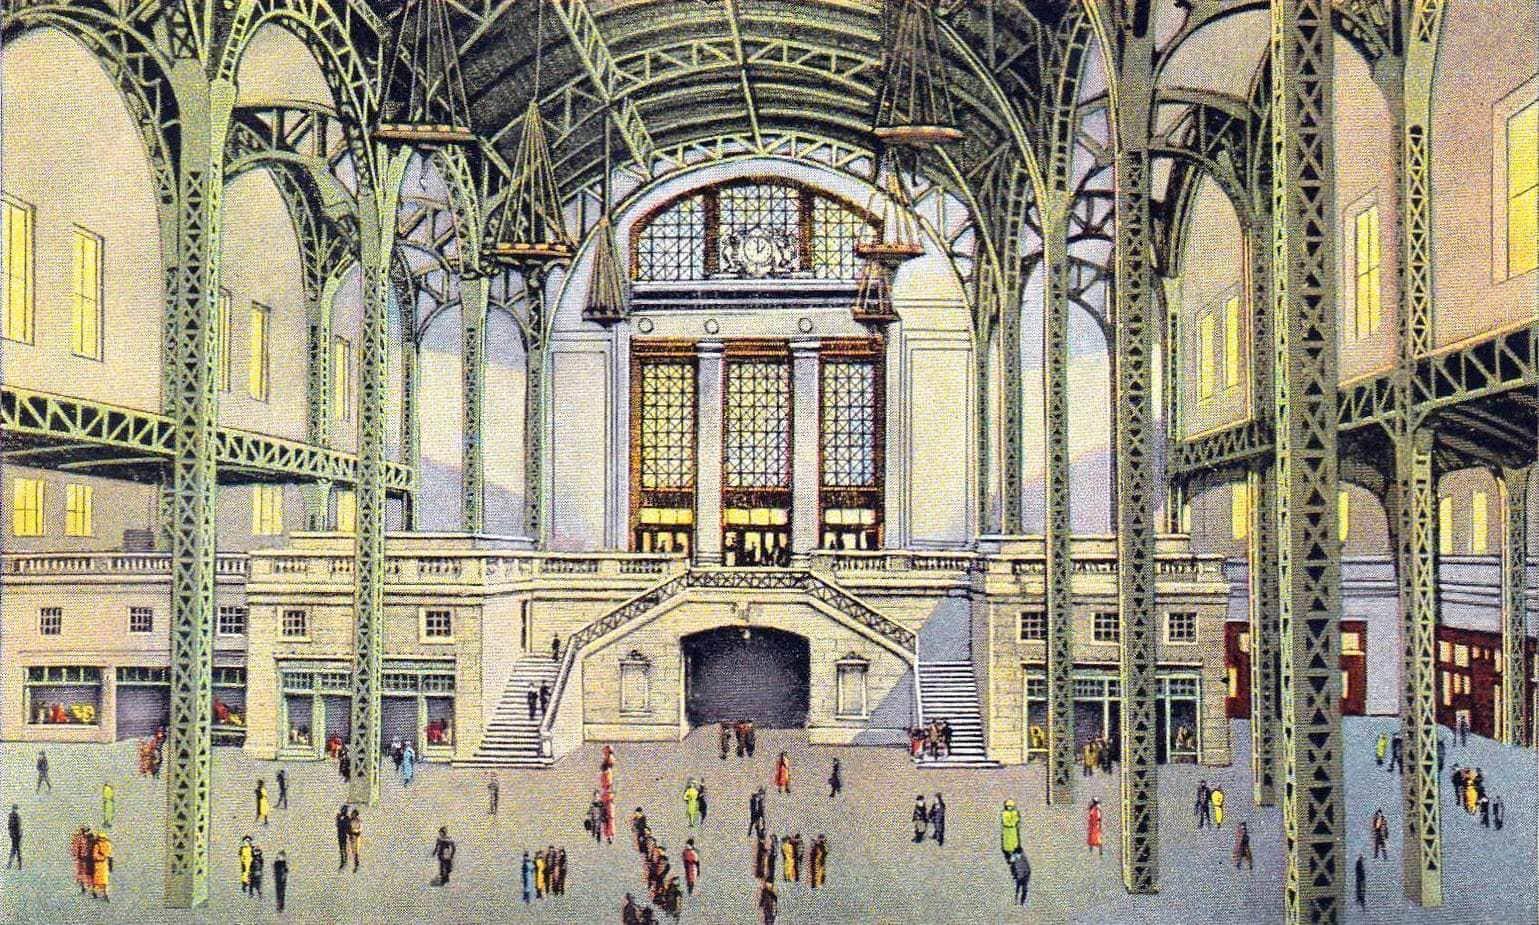 1920s Union Station train in Chicago Illinois